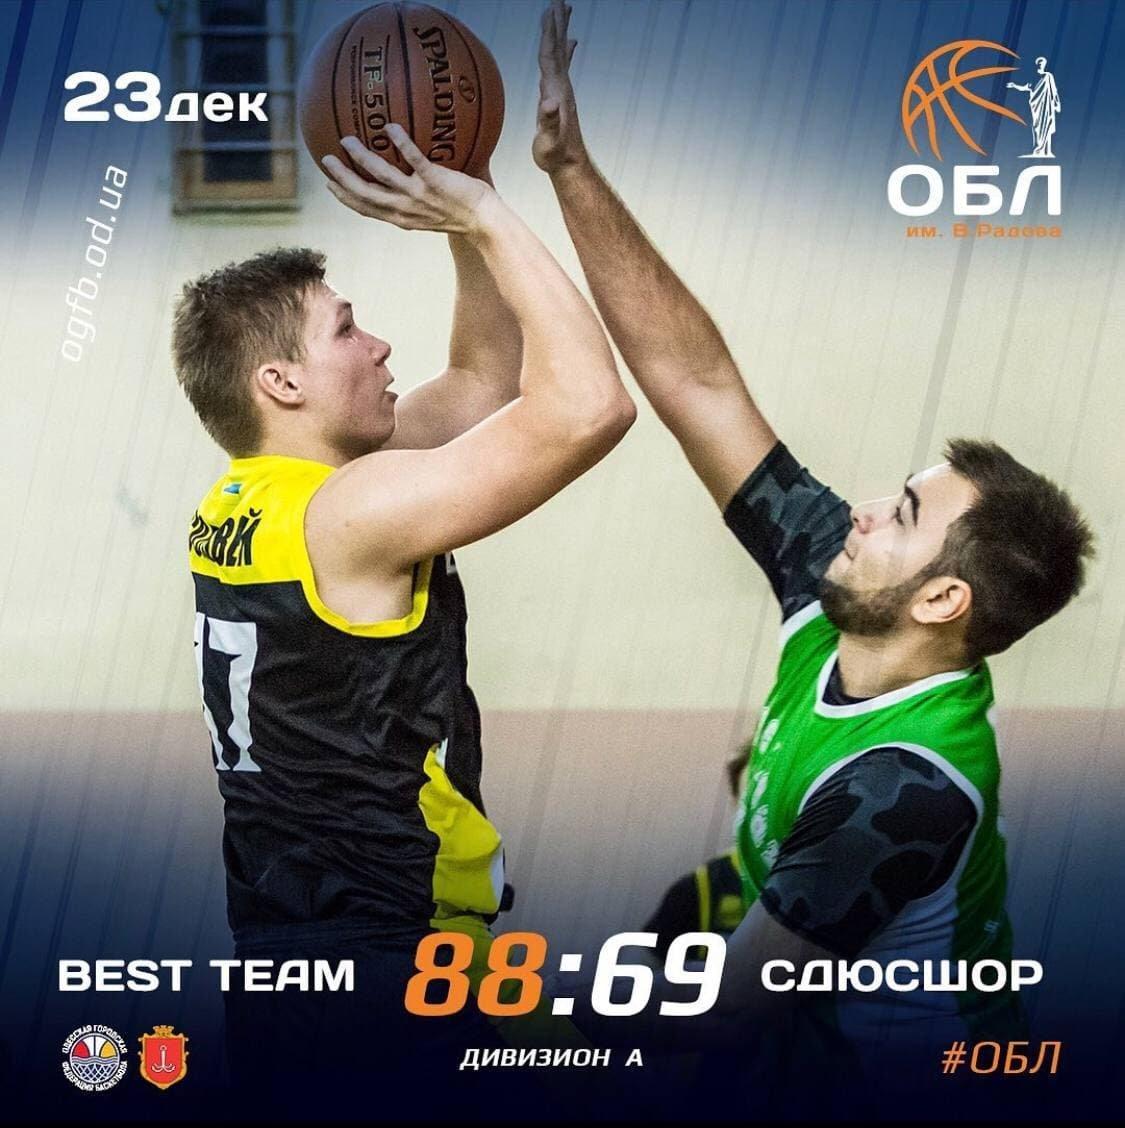 23.12.2020.ОБЛ: BEST TEAM - БИПА-СДЮСШОР